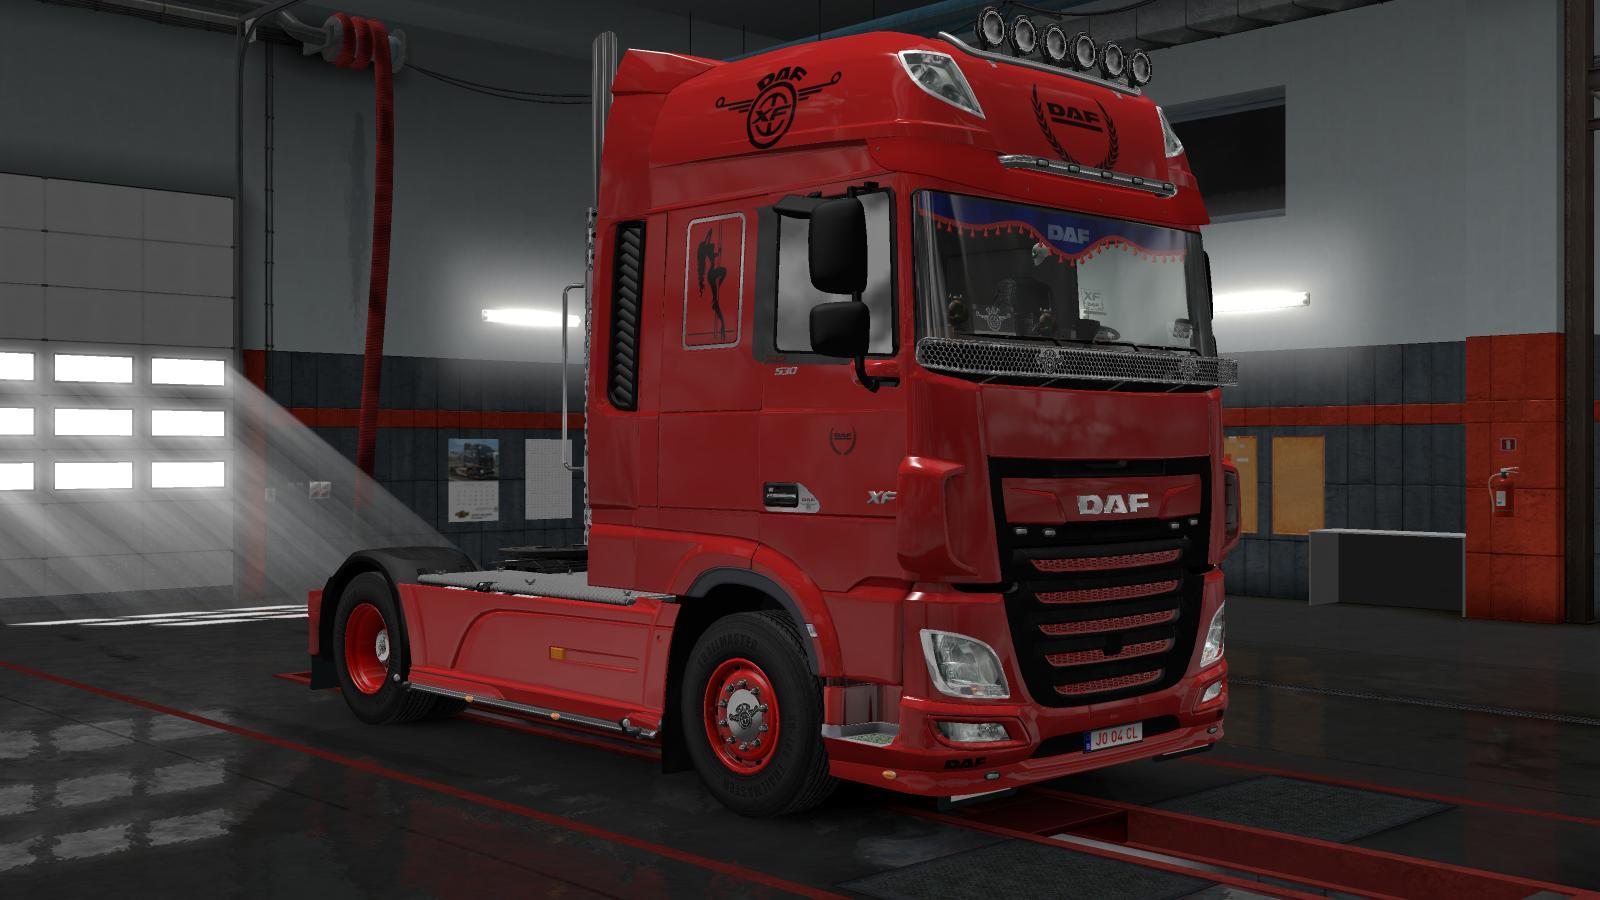 DAF EURO 6 1 30 TRUCK SKIN - ETS2 Mod